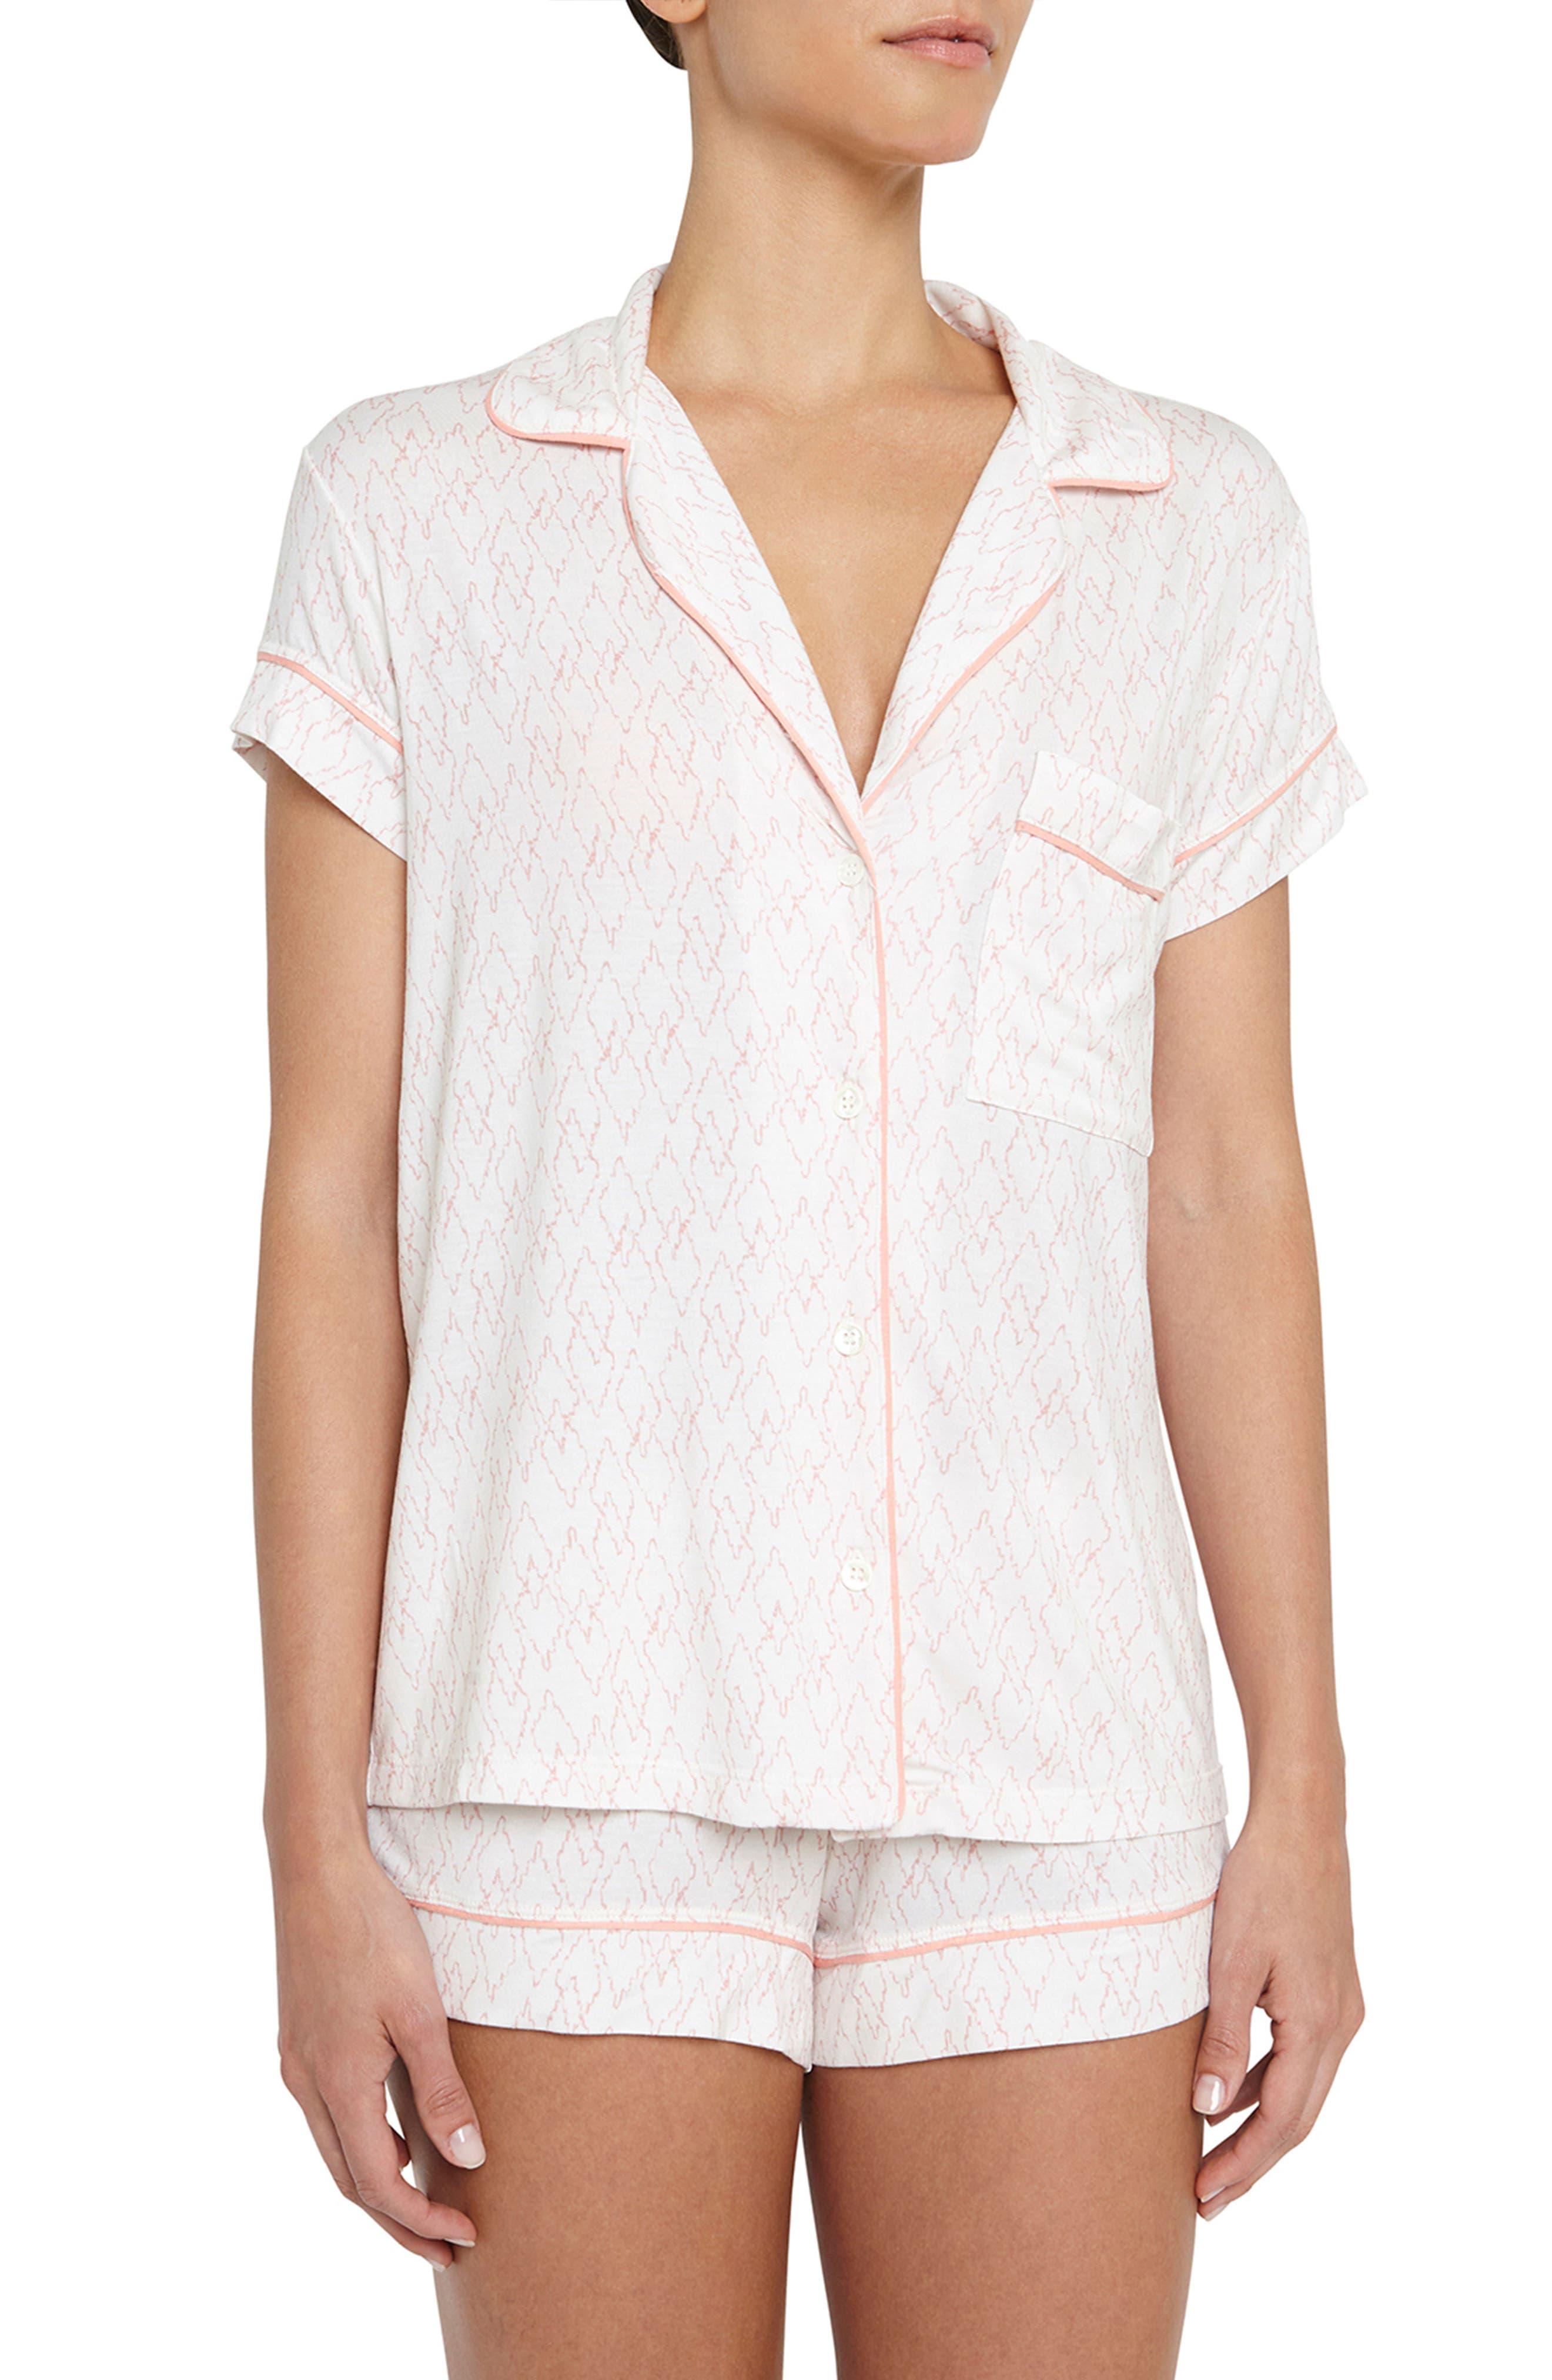 Sweet Heart Short Pajamas,                         Main,                         color, Ivory/ Candlelight Peach